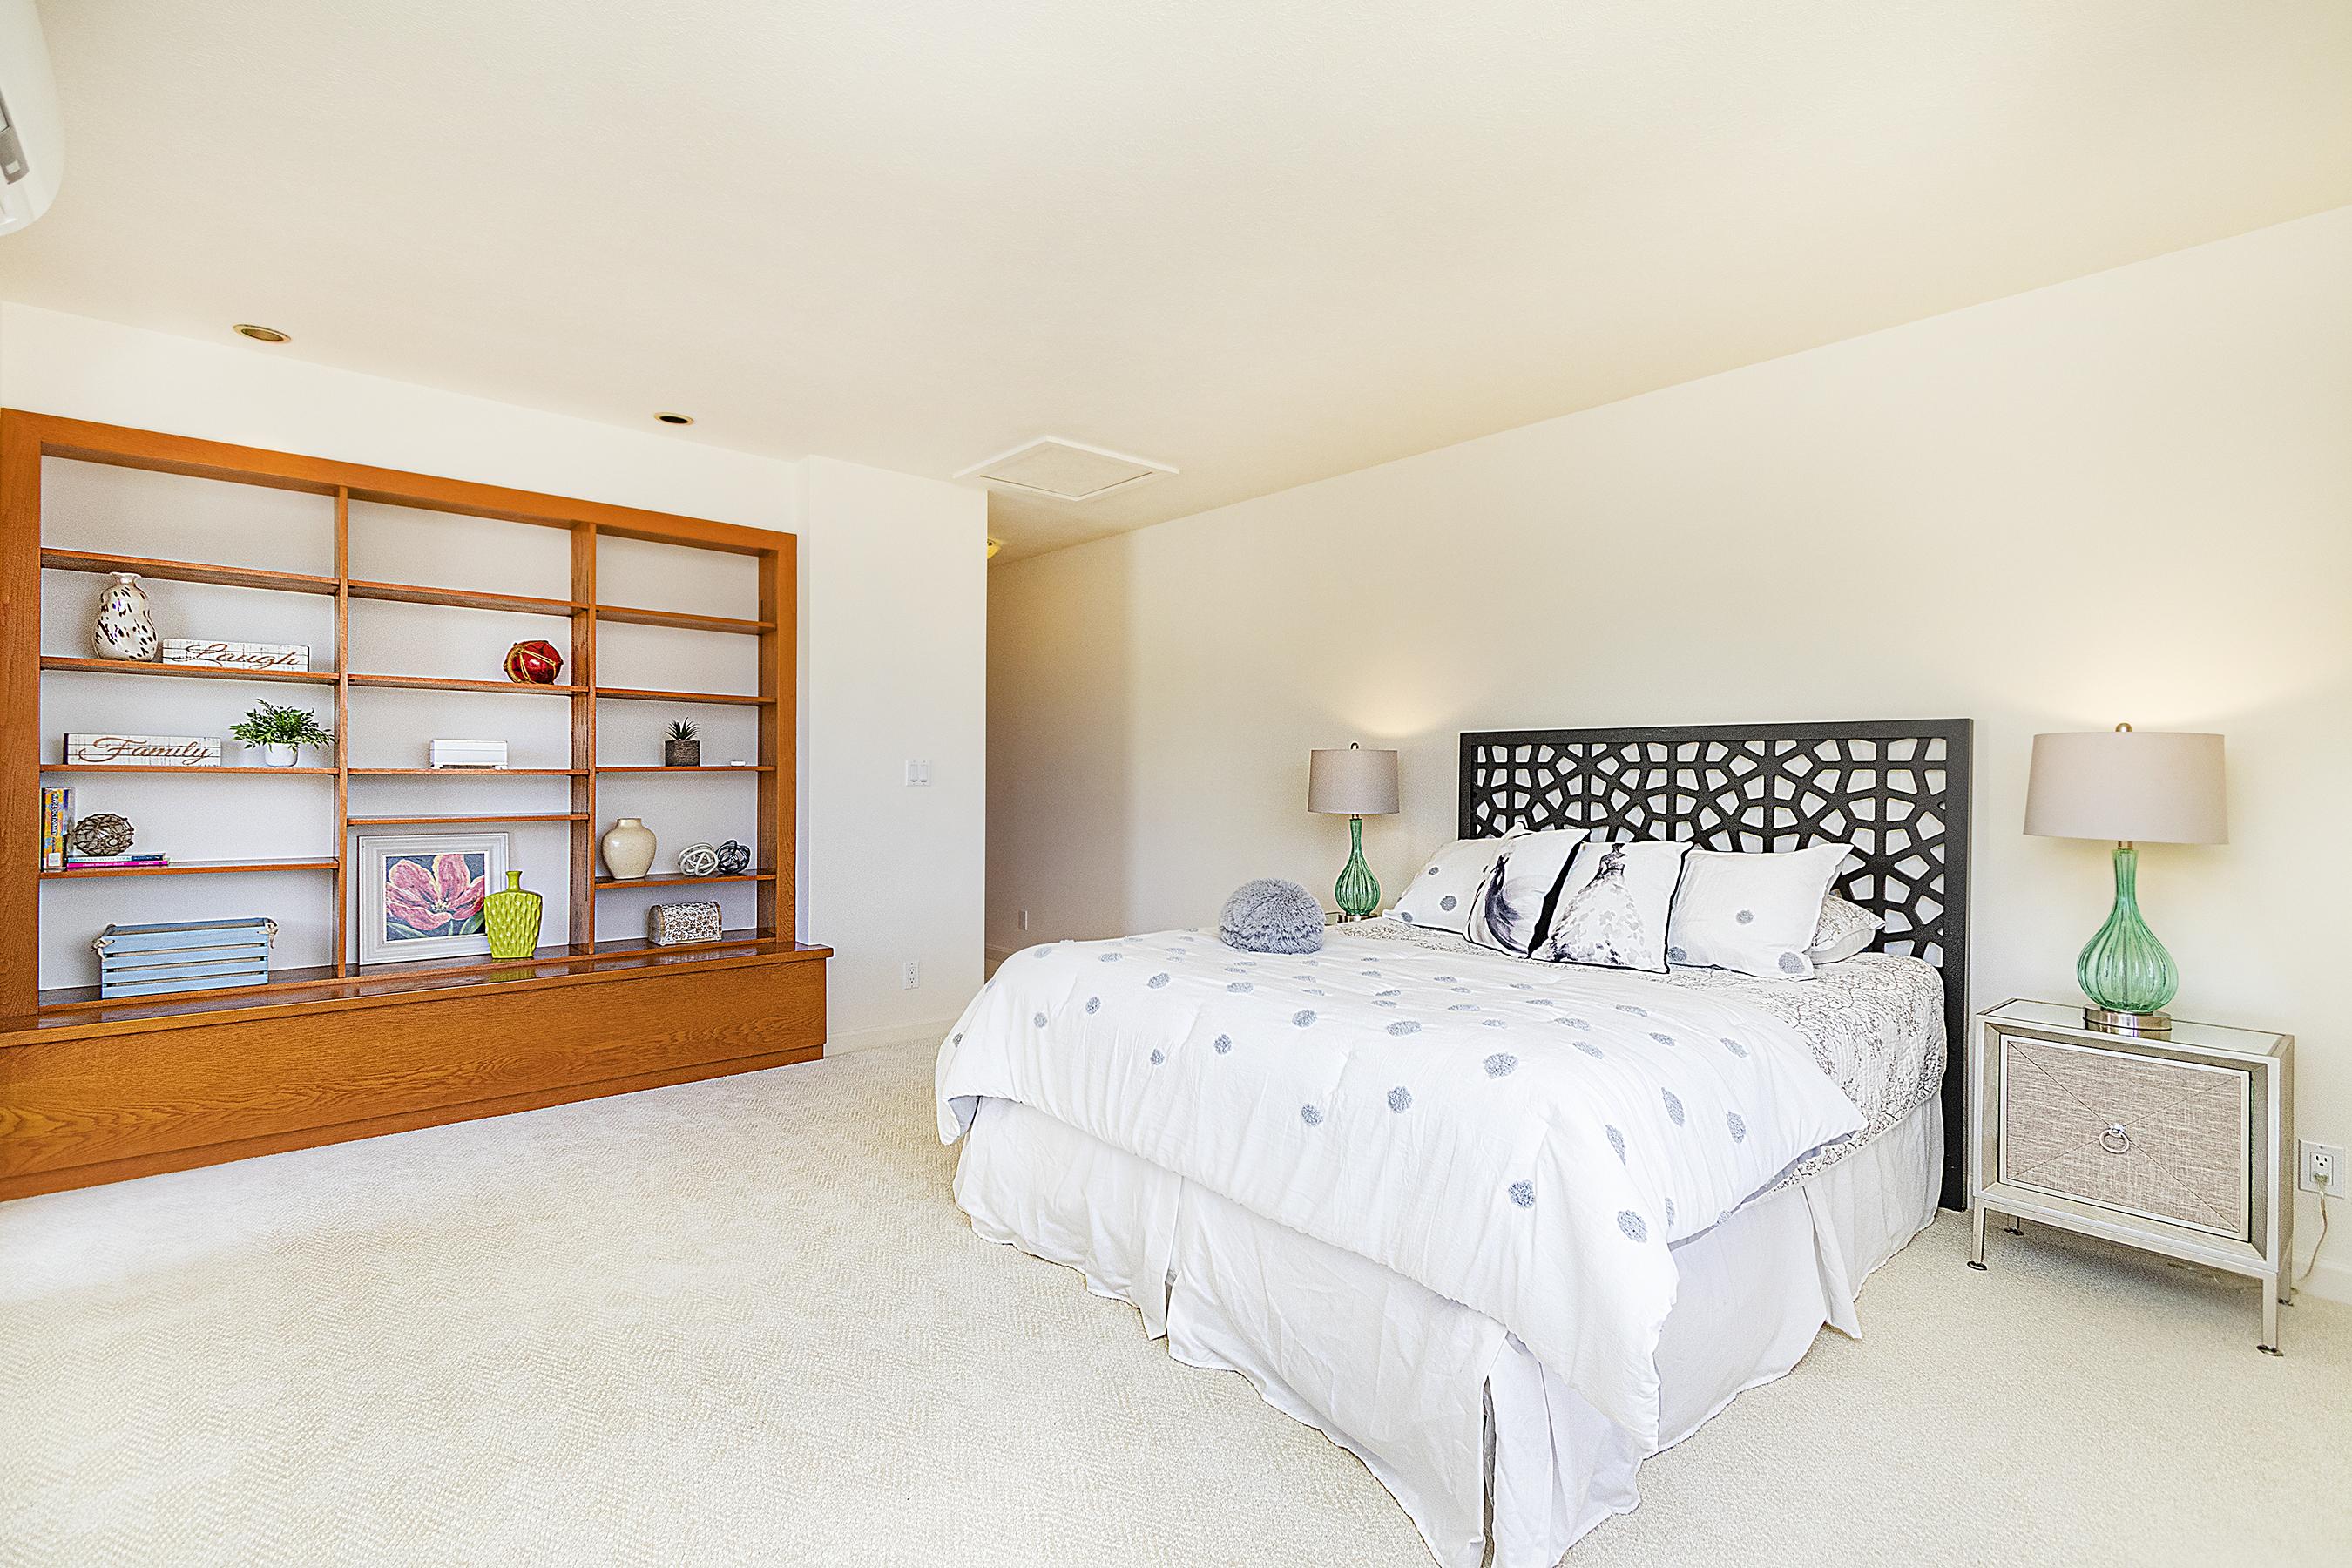 Bedroom four at 4323 Kaikoo Place, Honolulu, HI 96816